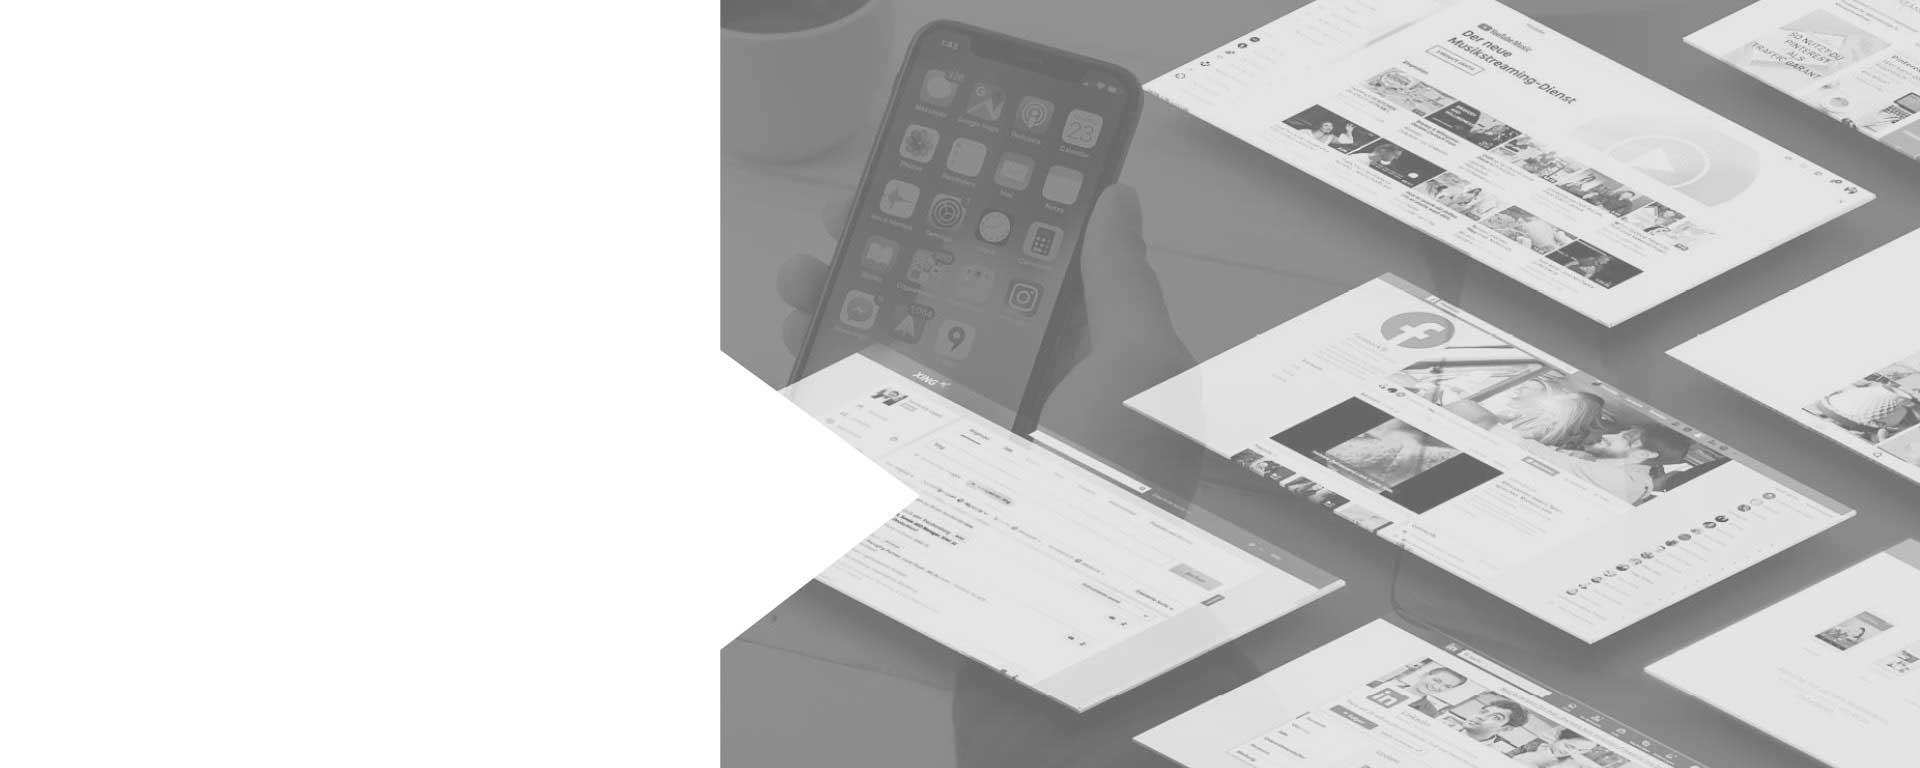 Google Business Facebook Instagram Onlineplattformen Business Social Media